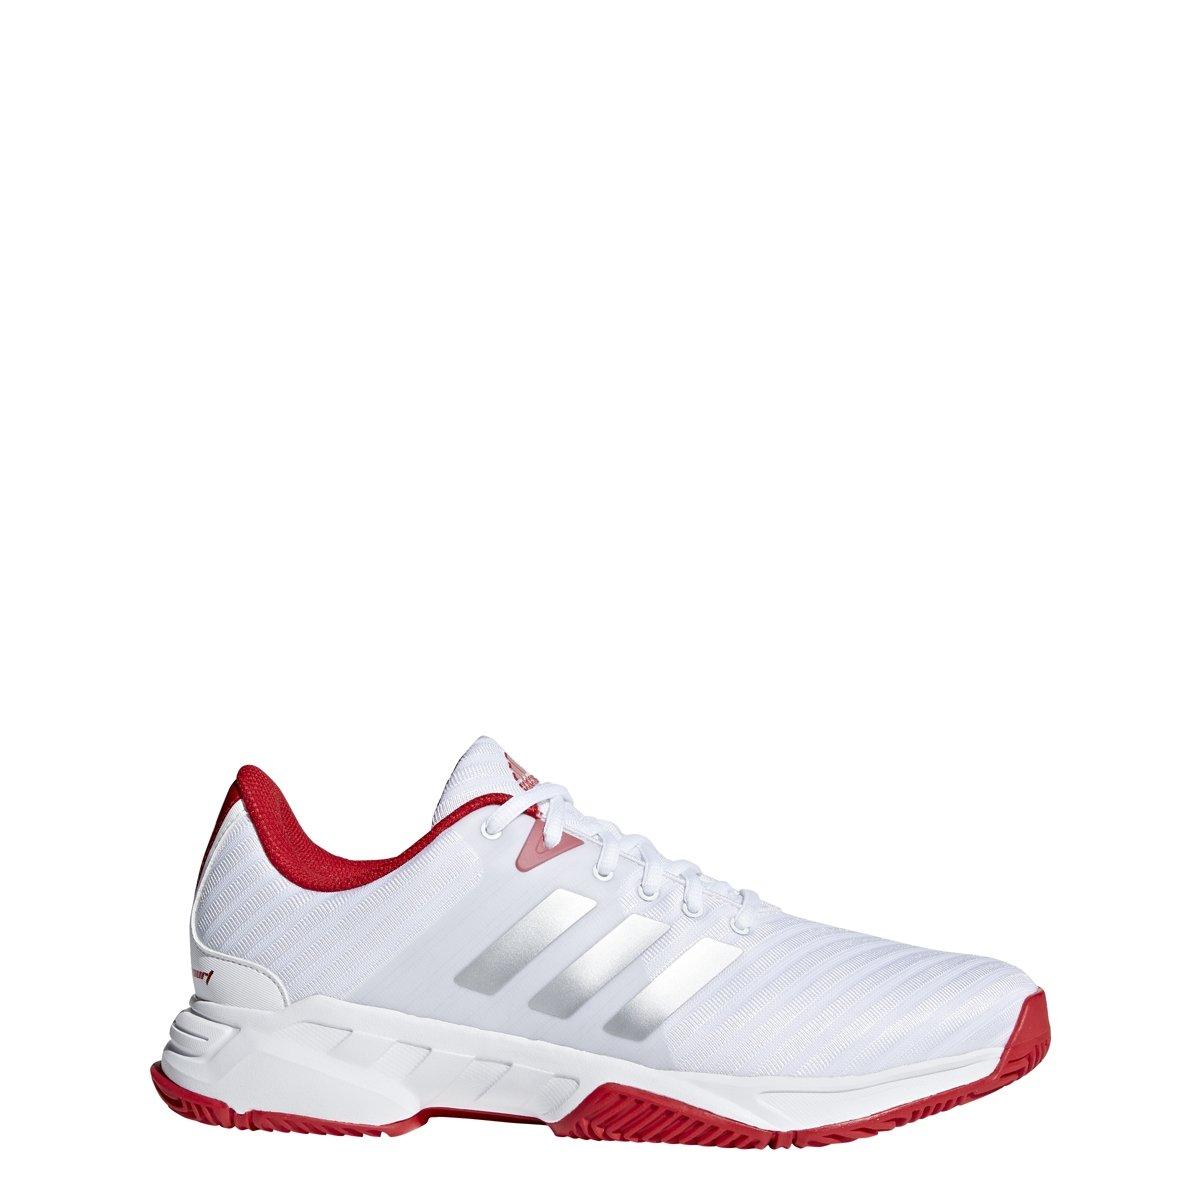 adidas Performance Men's Barricade Court 3 Tennis Shoe, White/Matte Silver/Scarlet, 10 M US